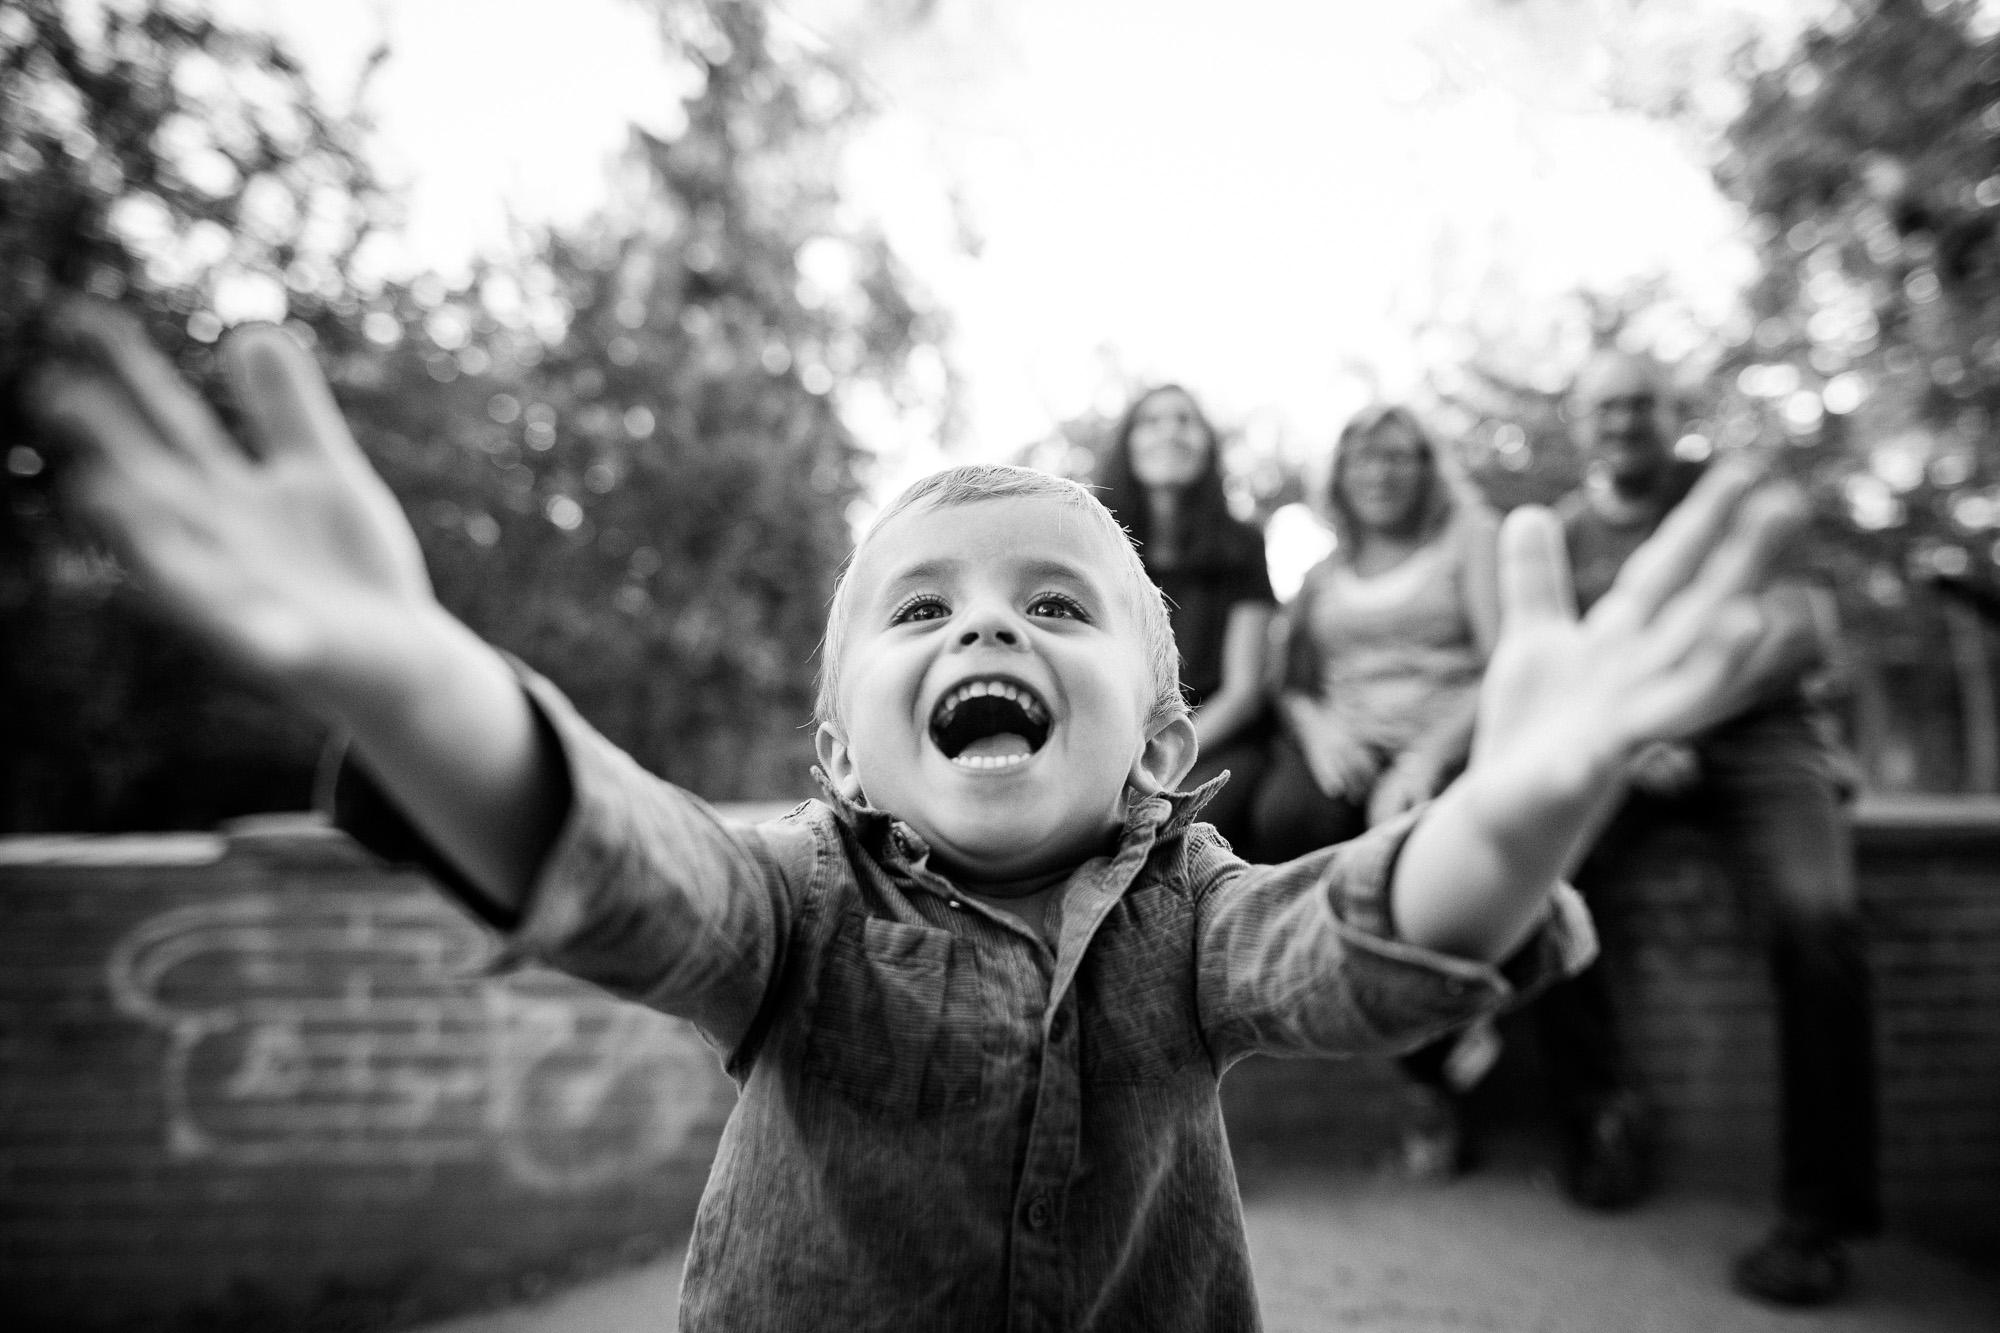 photographe-famille-toulouse-anais-bertrand_s-amuser-1